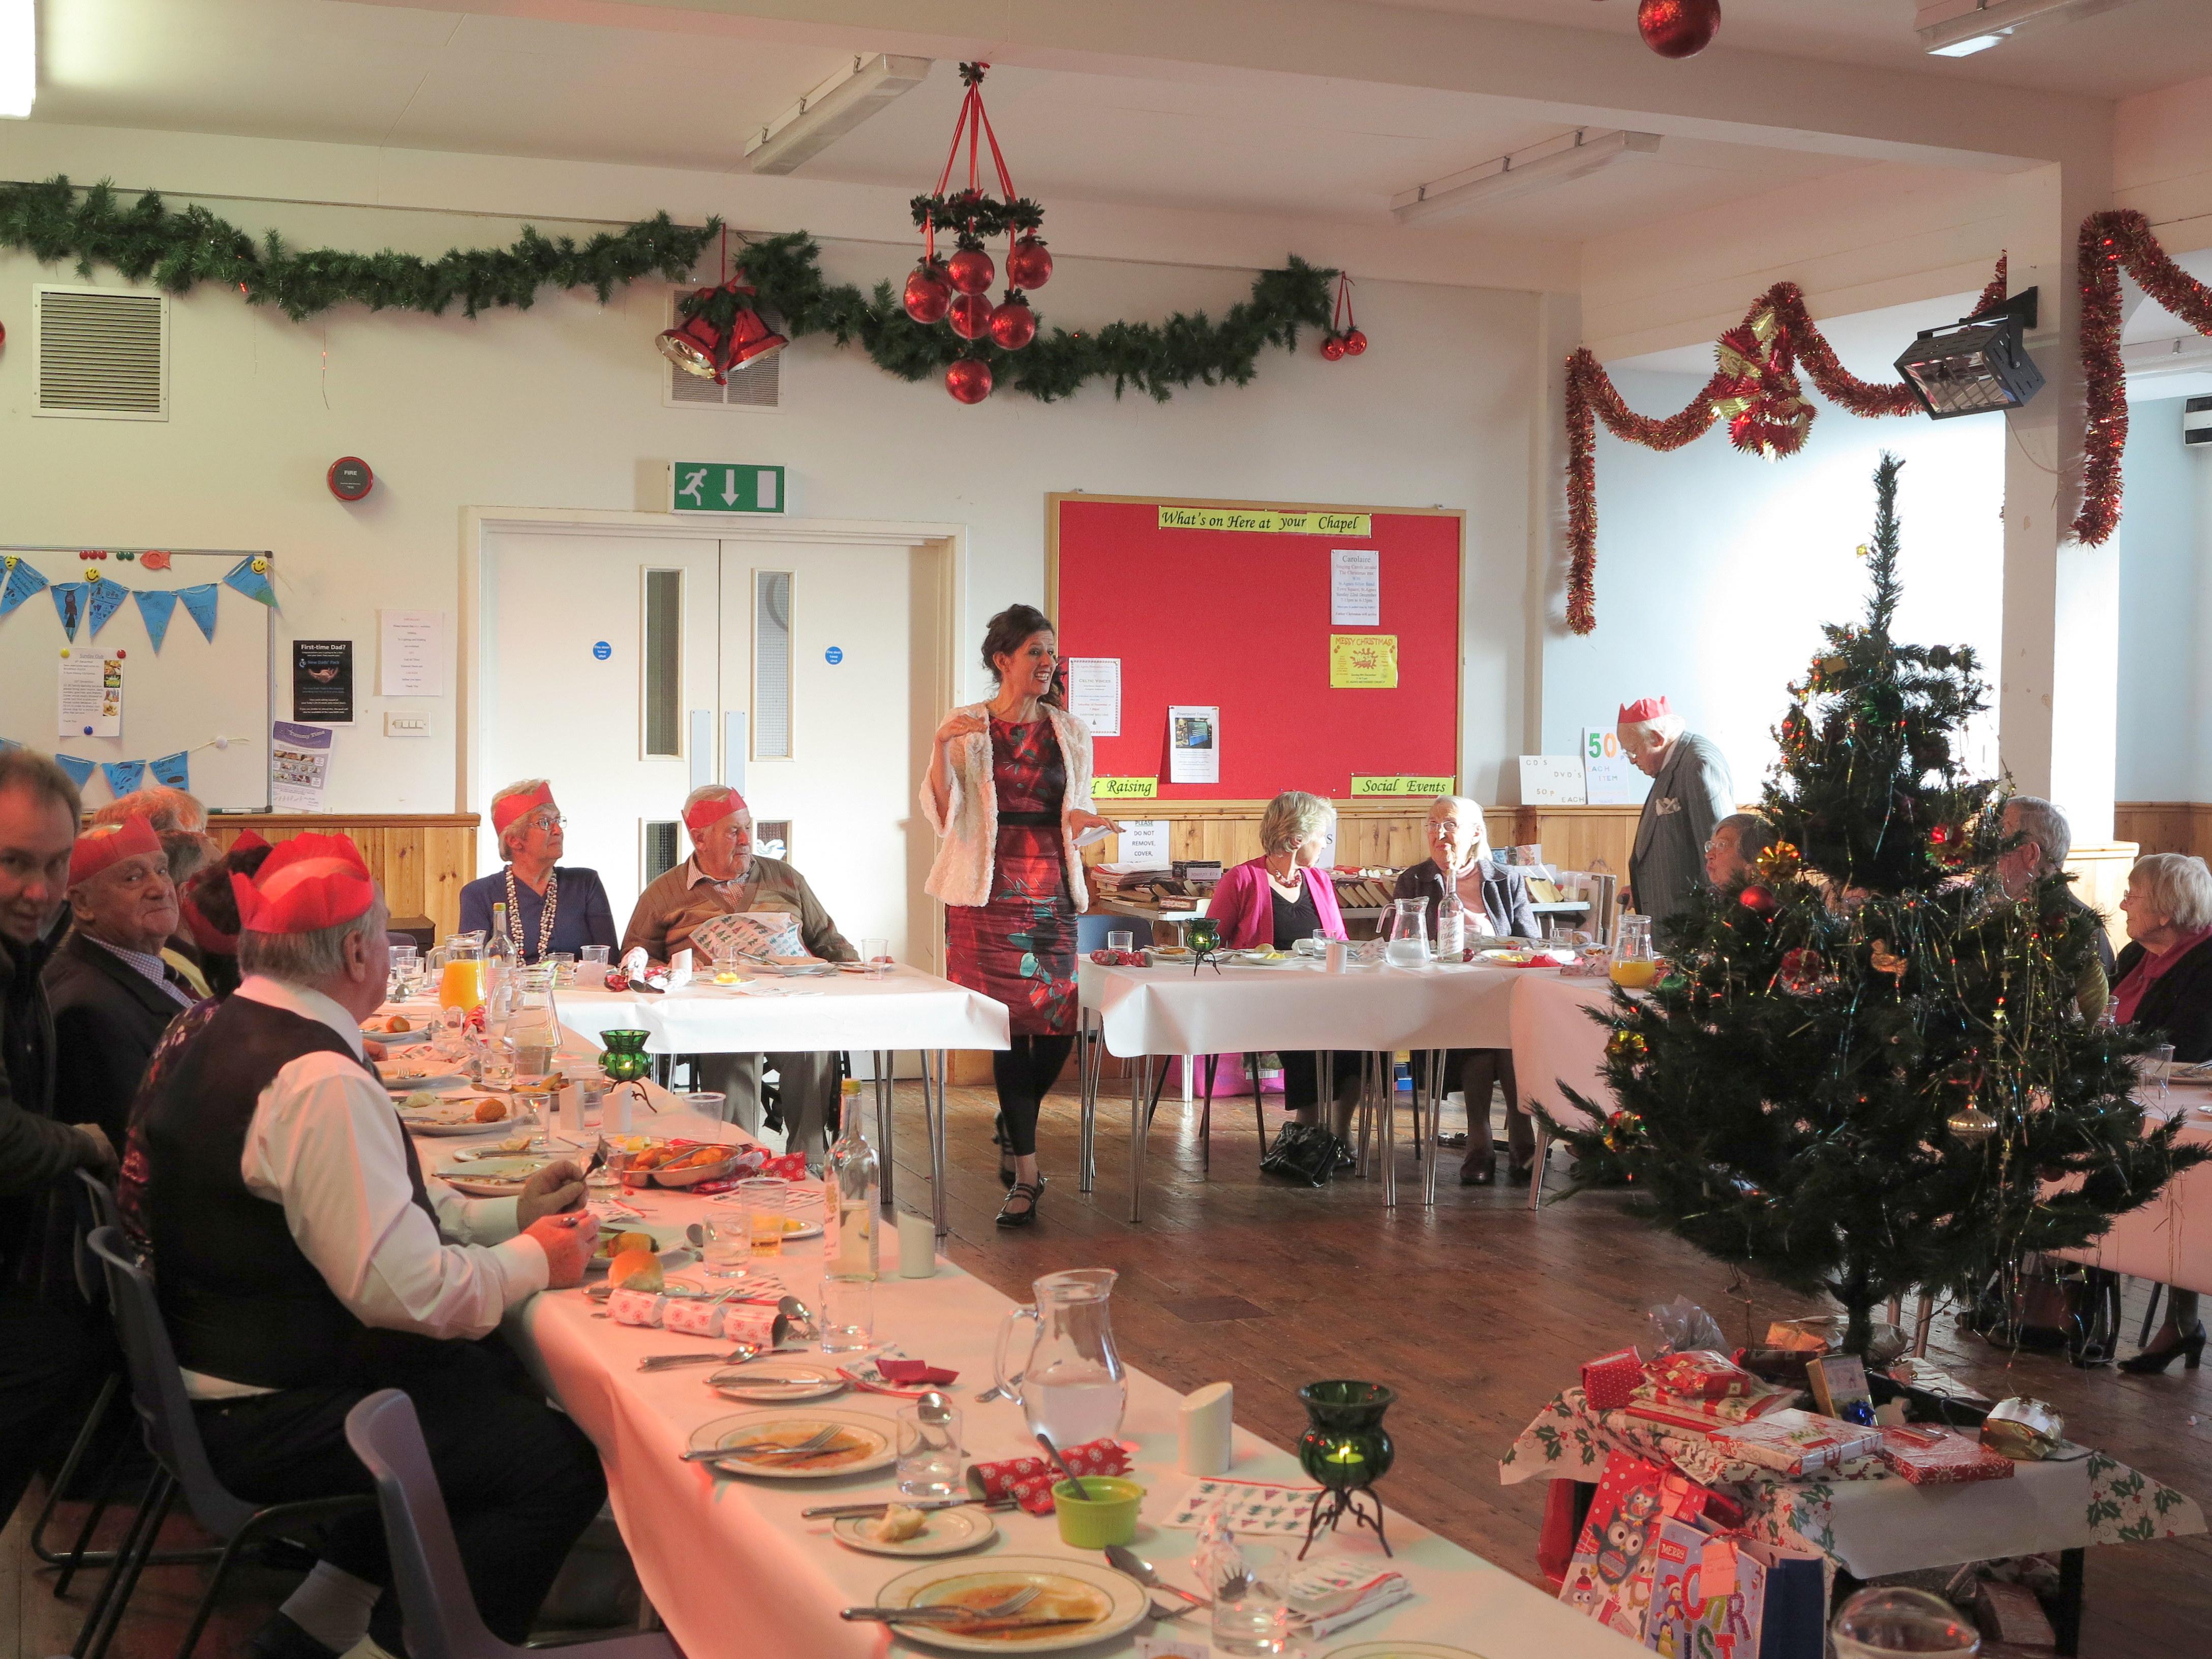 Koru Kayaking help organise a Christmas Party for War Veterans